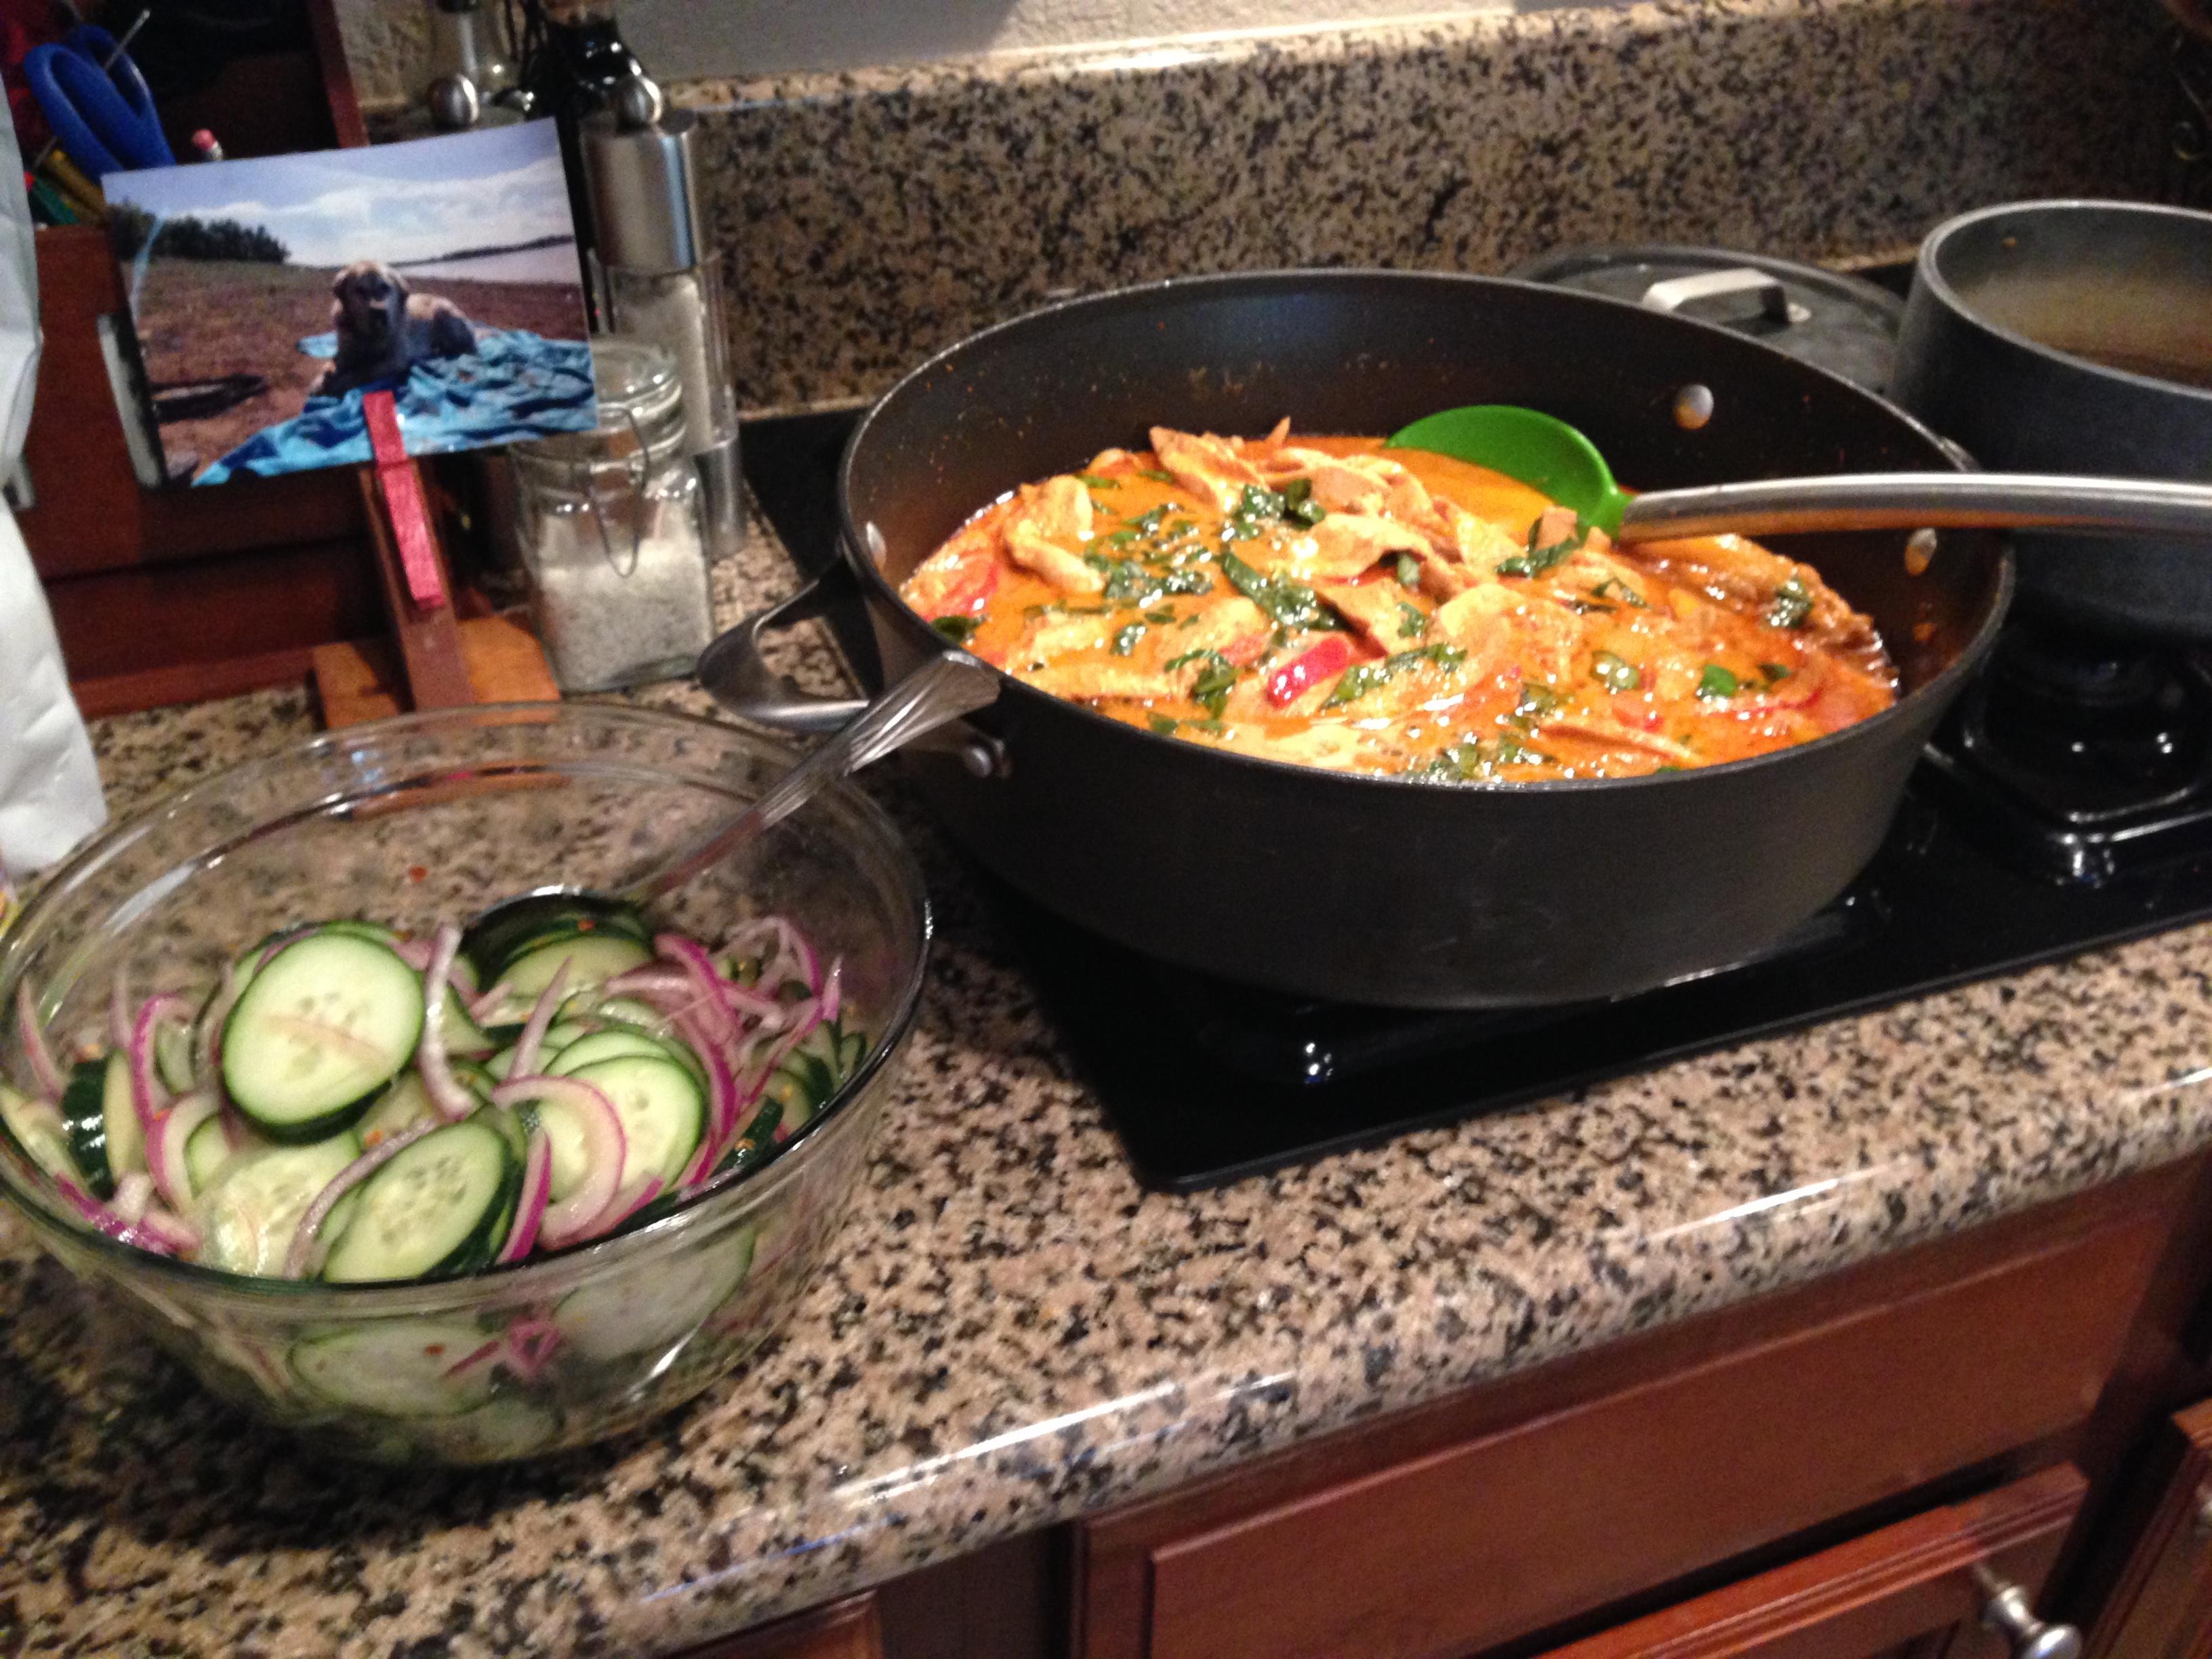 Thai shrimp curry with cucumber salad - gluten free - Paleo - healthy dinner recipe - Triumph Over H